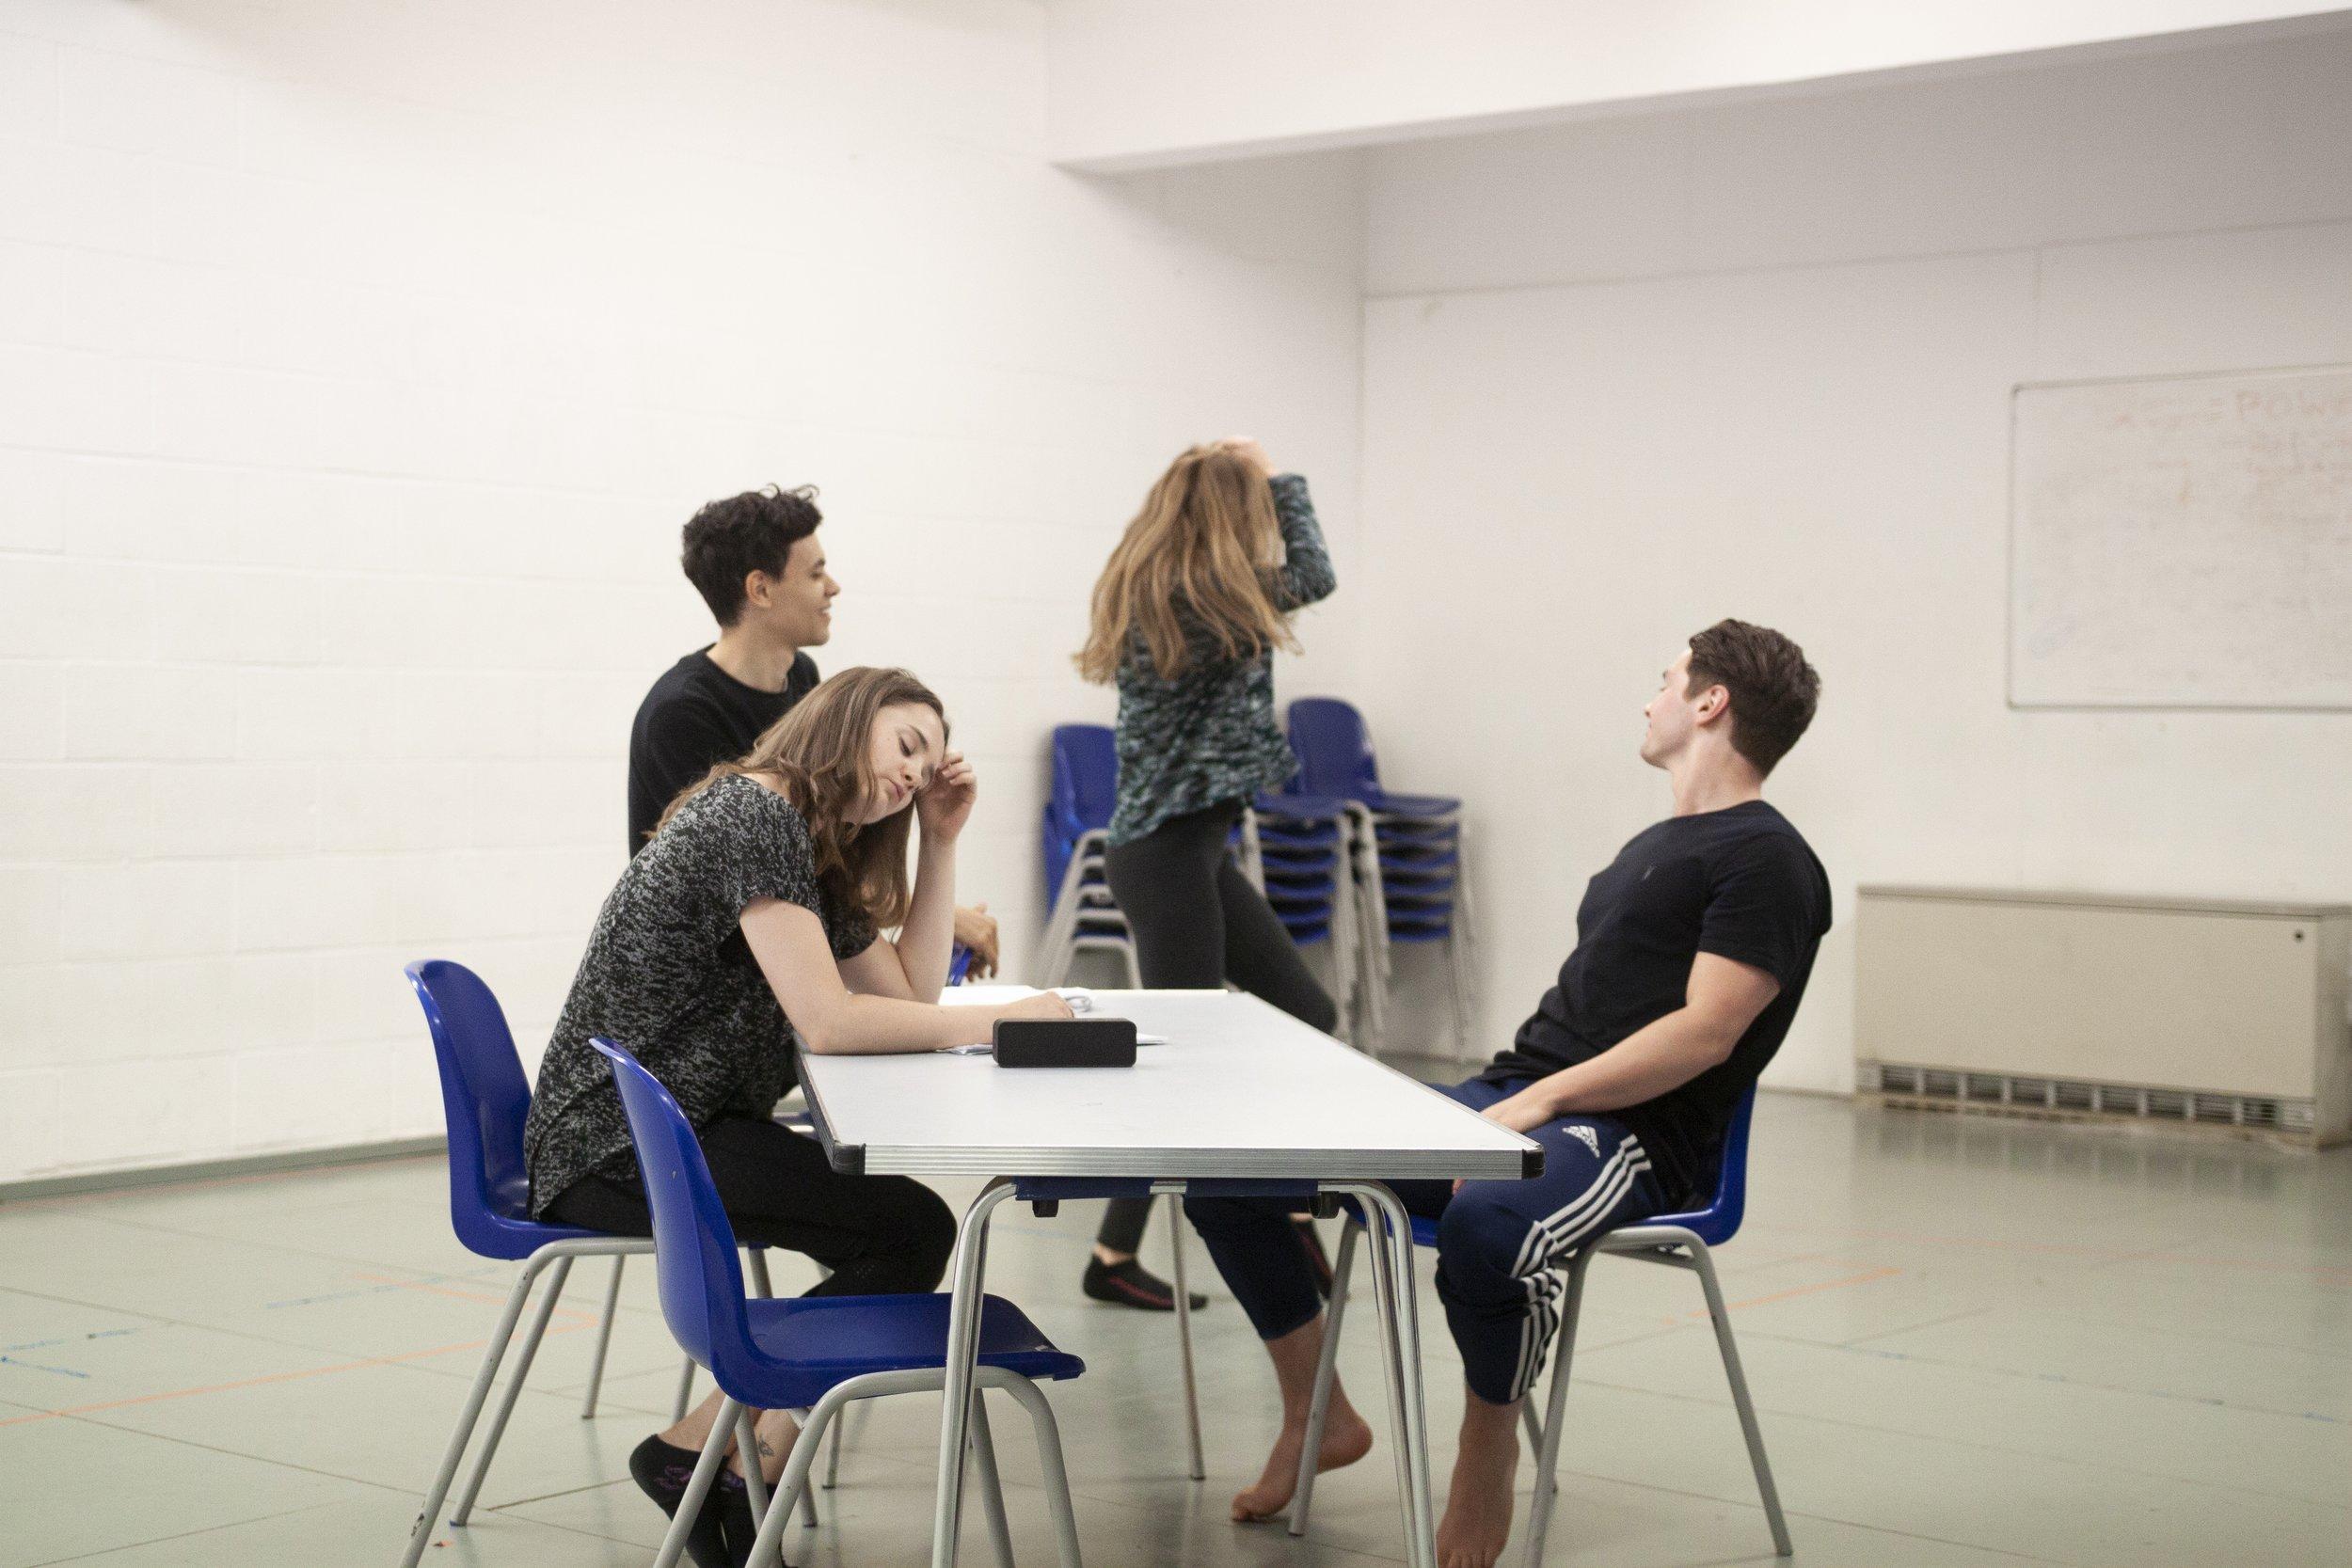 Left to right: Jennie Eggleton (Carrie), Aaron Douglas (Ollie), Kathryn Crosby (Laura), George John (Christian), rehearsal image.